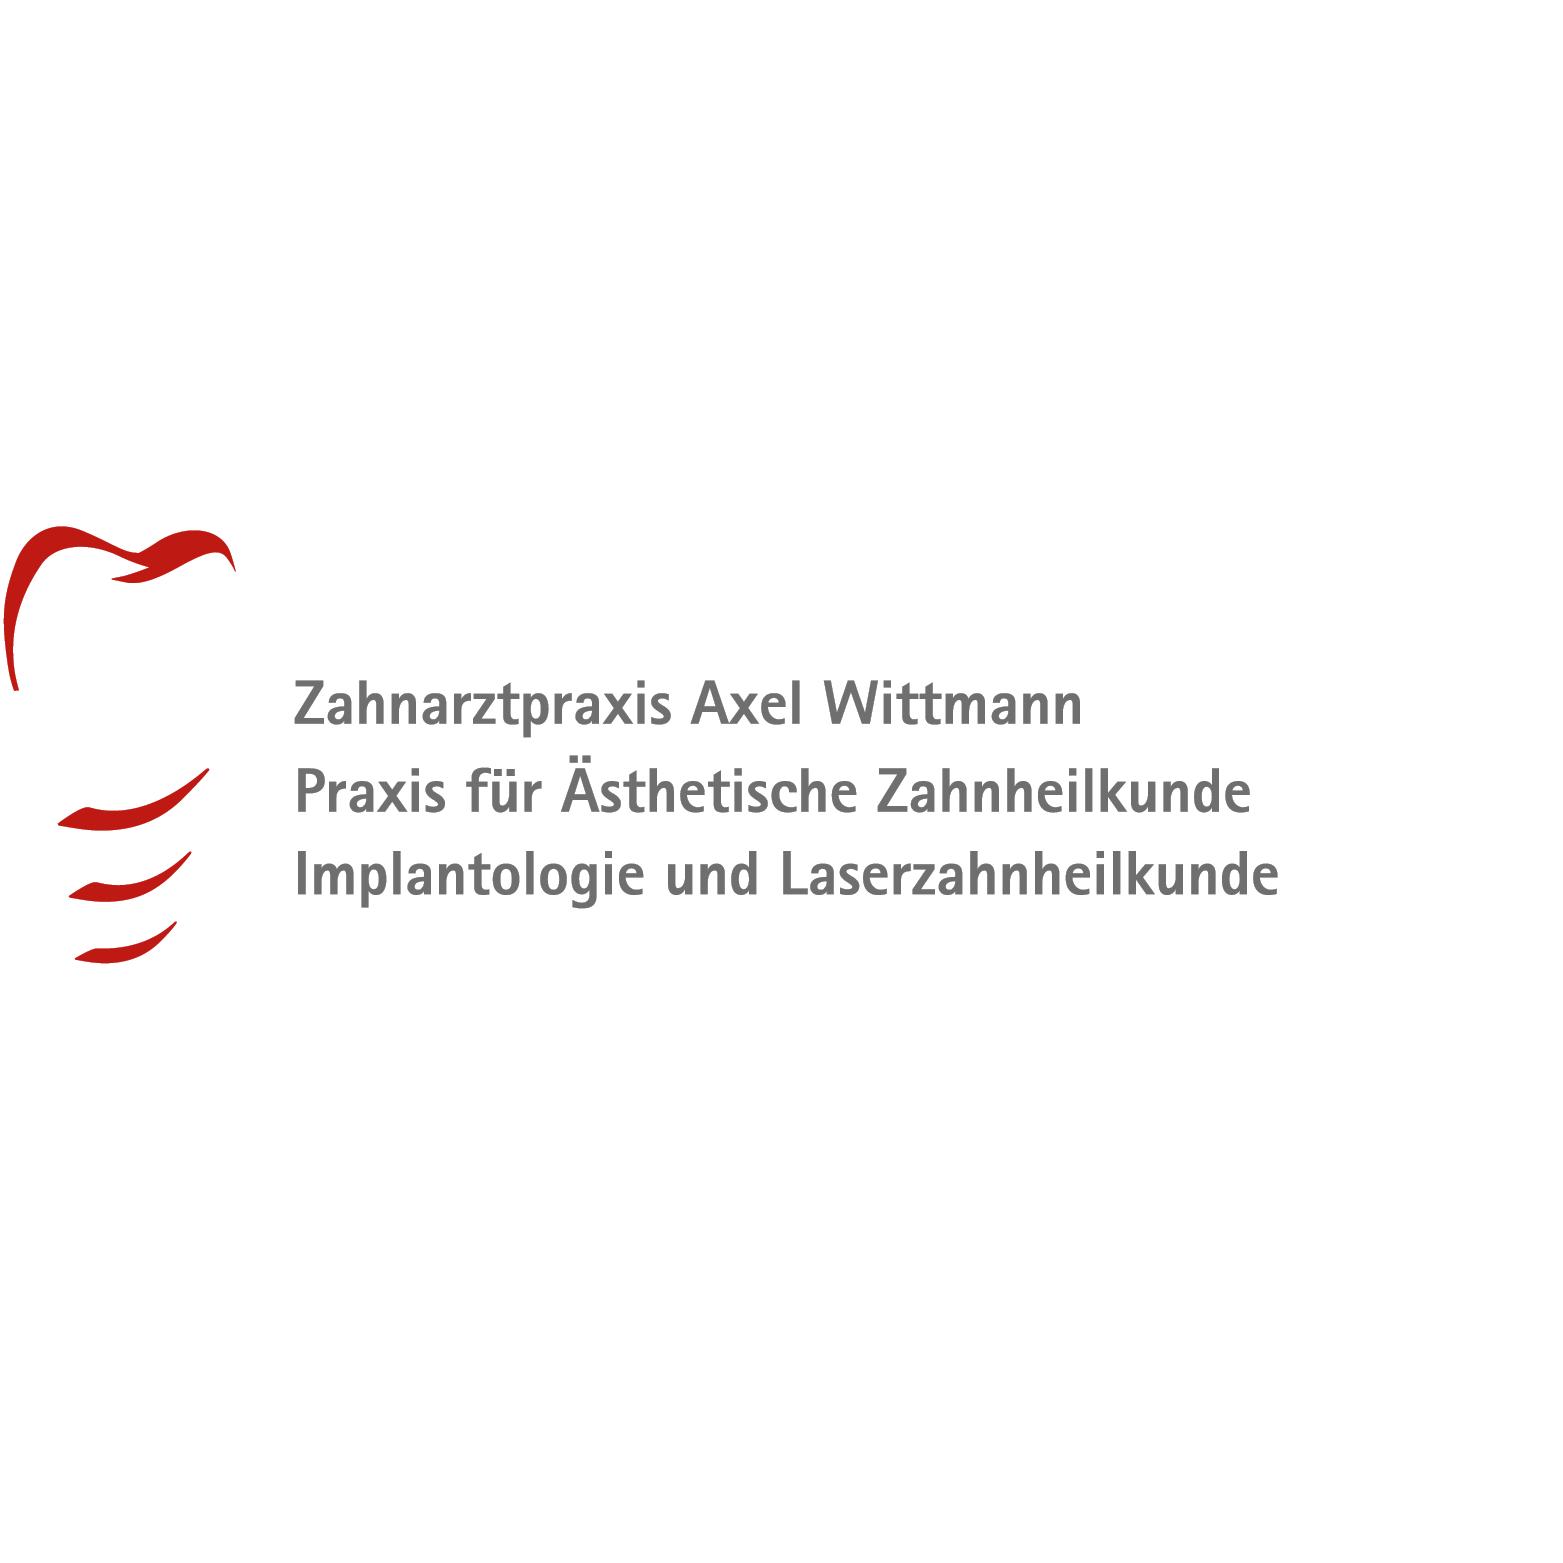 Bild zu Zahnarztpraxis Axel Wittmann in Altenholz